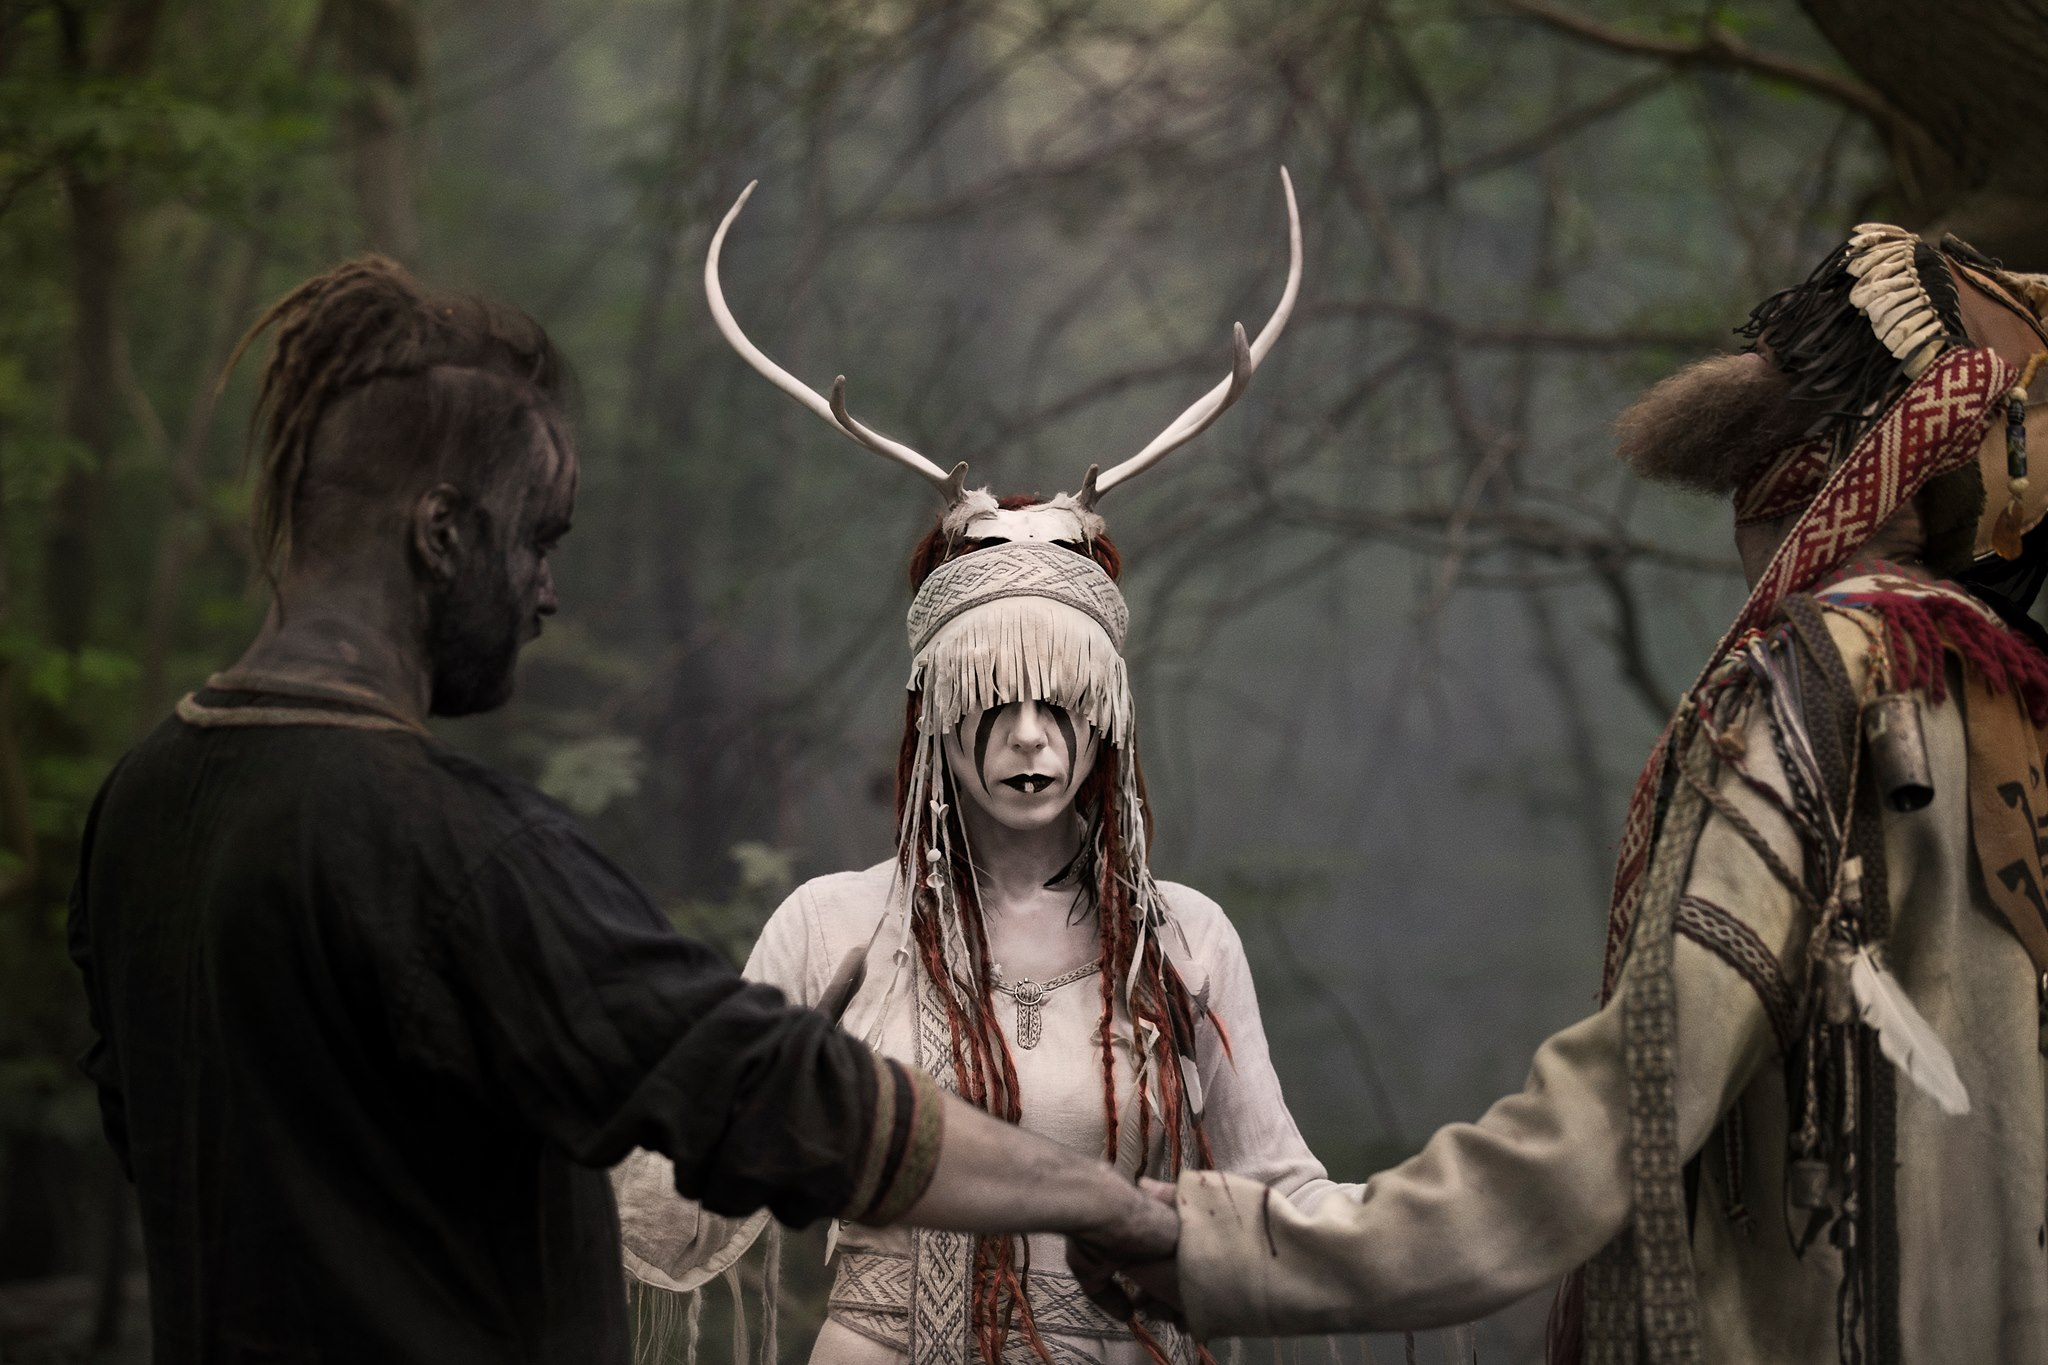 People 2048x1365 Heilung Heilung Band norse folk metal folk music headdress Maria Franz Kai Uwe Faust Christopher Juul forest